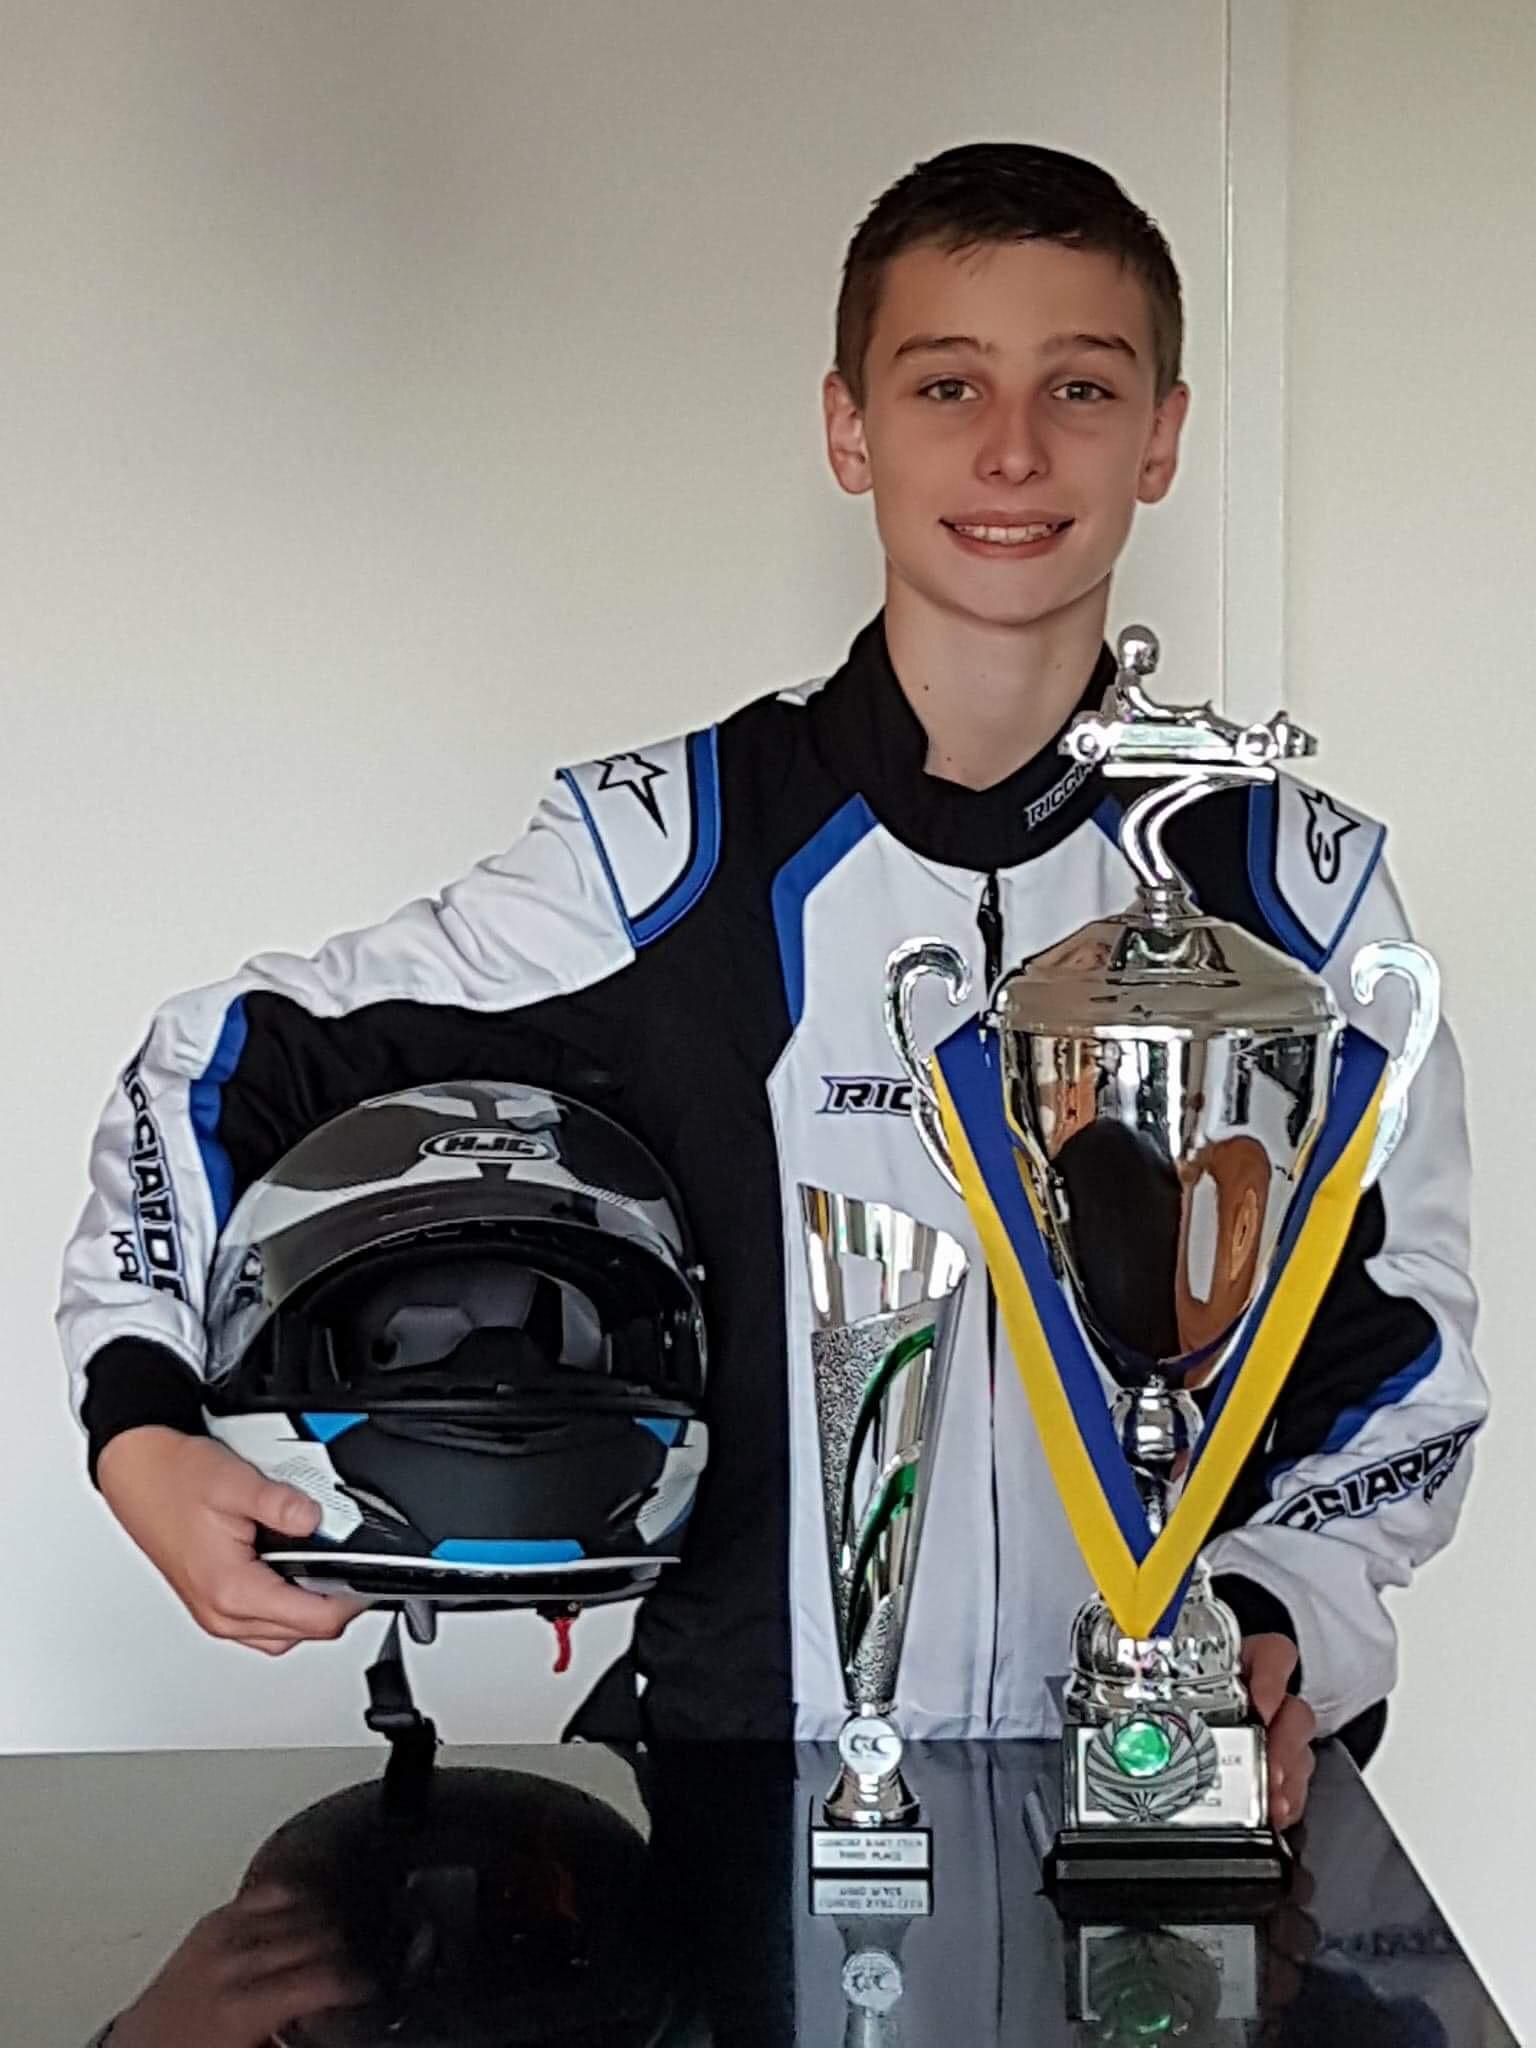 Ryan-Karting-2-002.jpg?mtime=20180531141